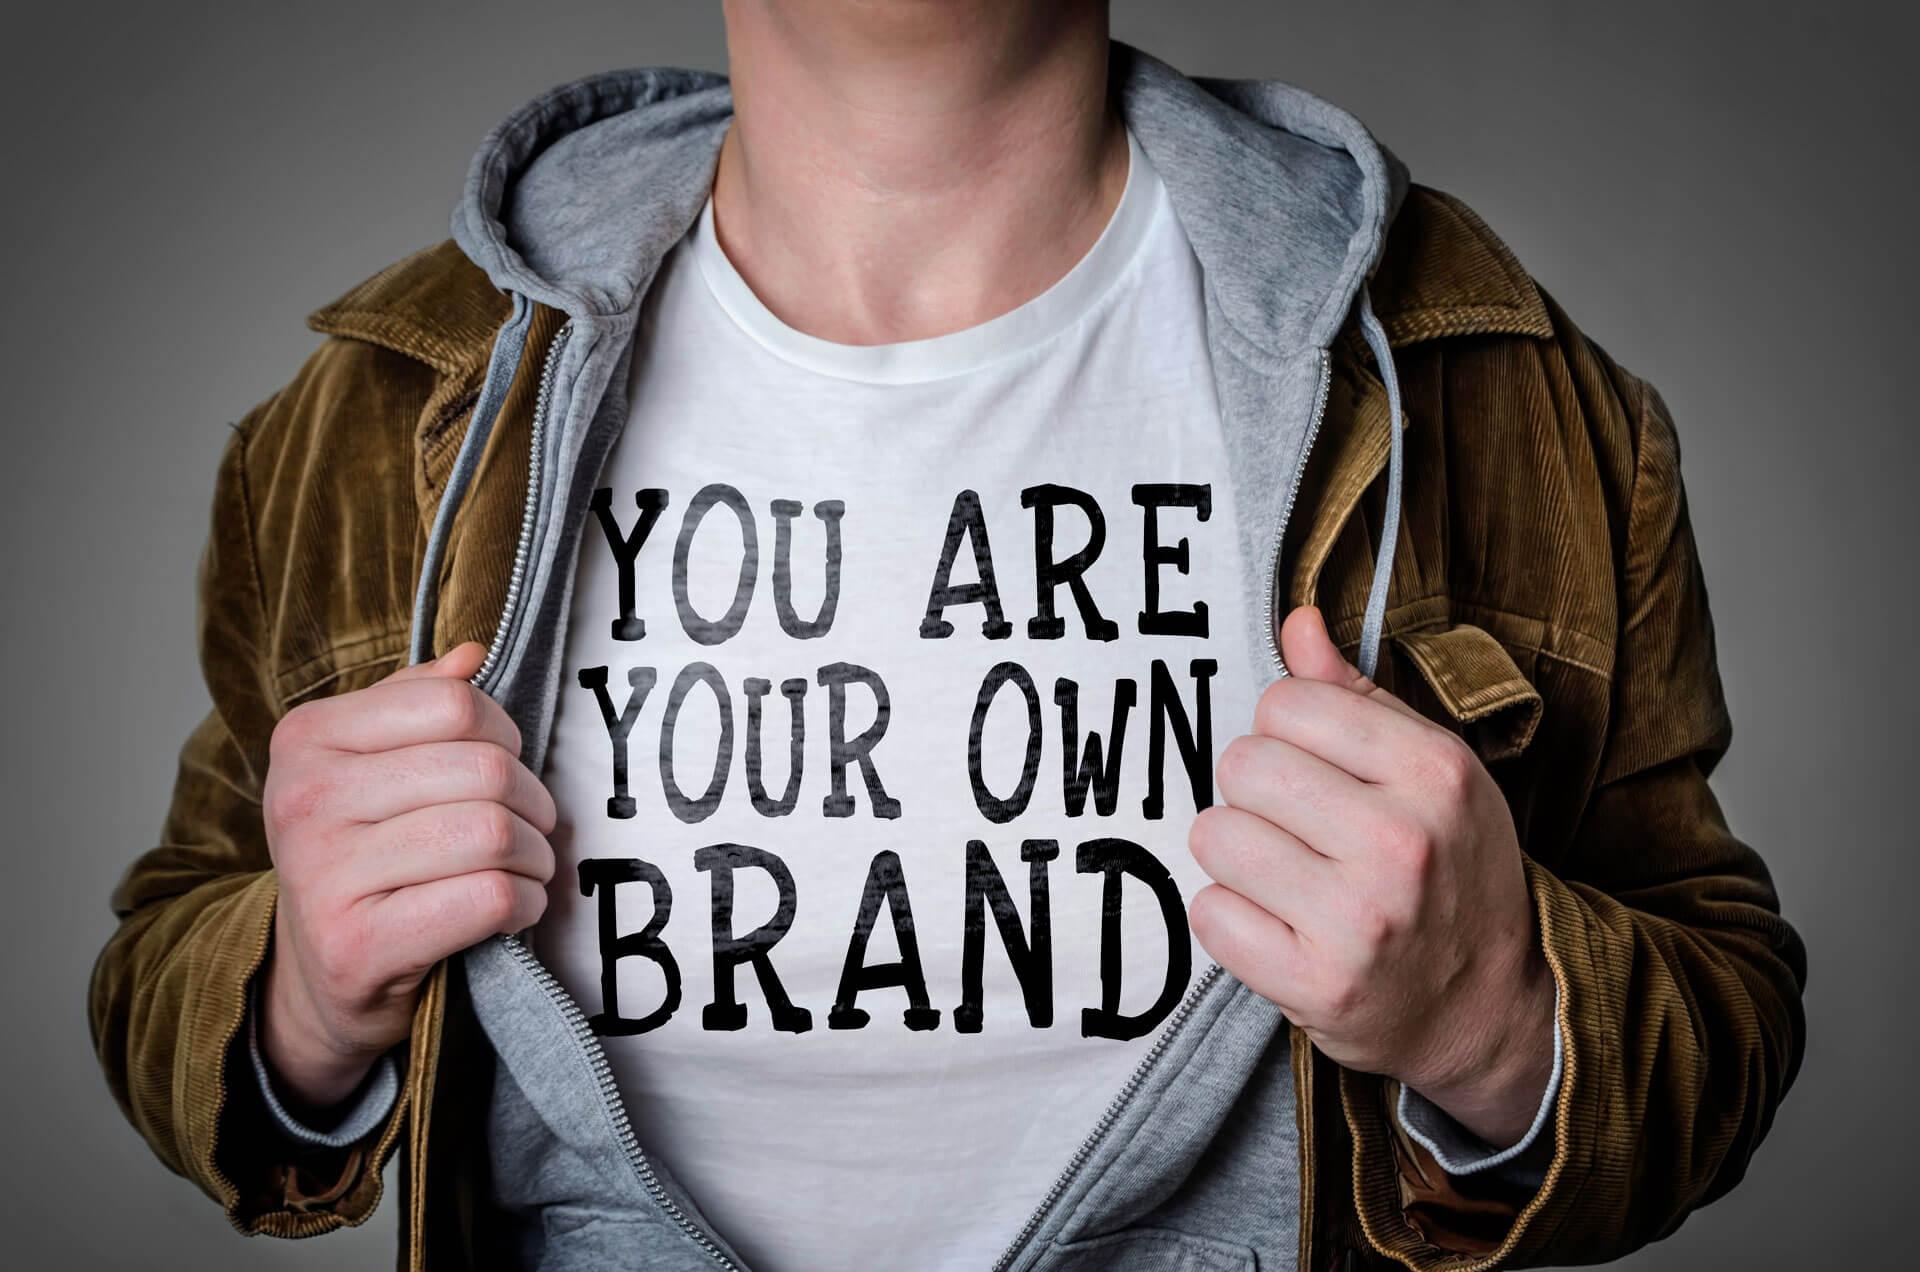 personal-brand-equity-image.jpg